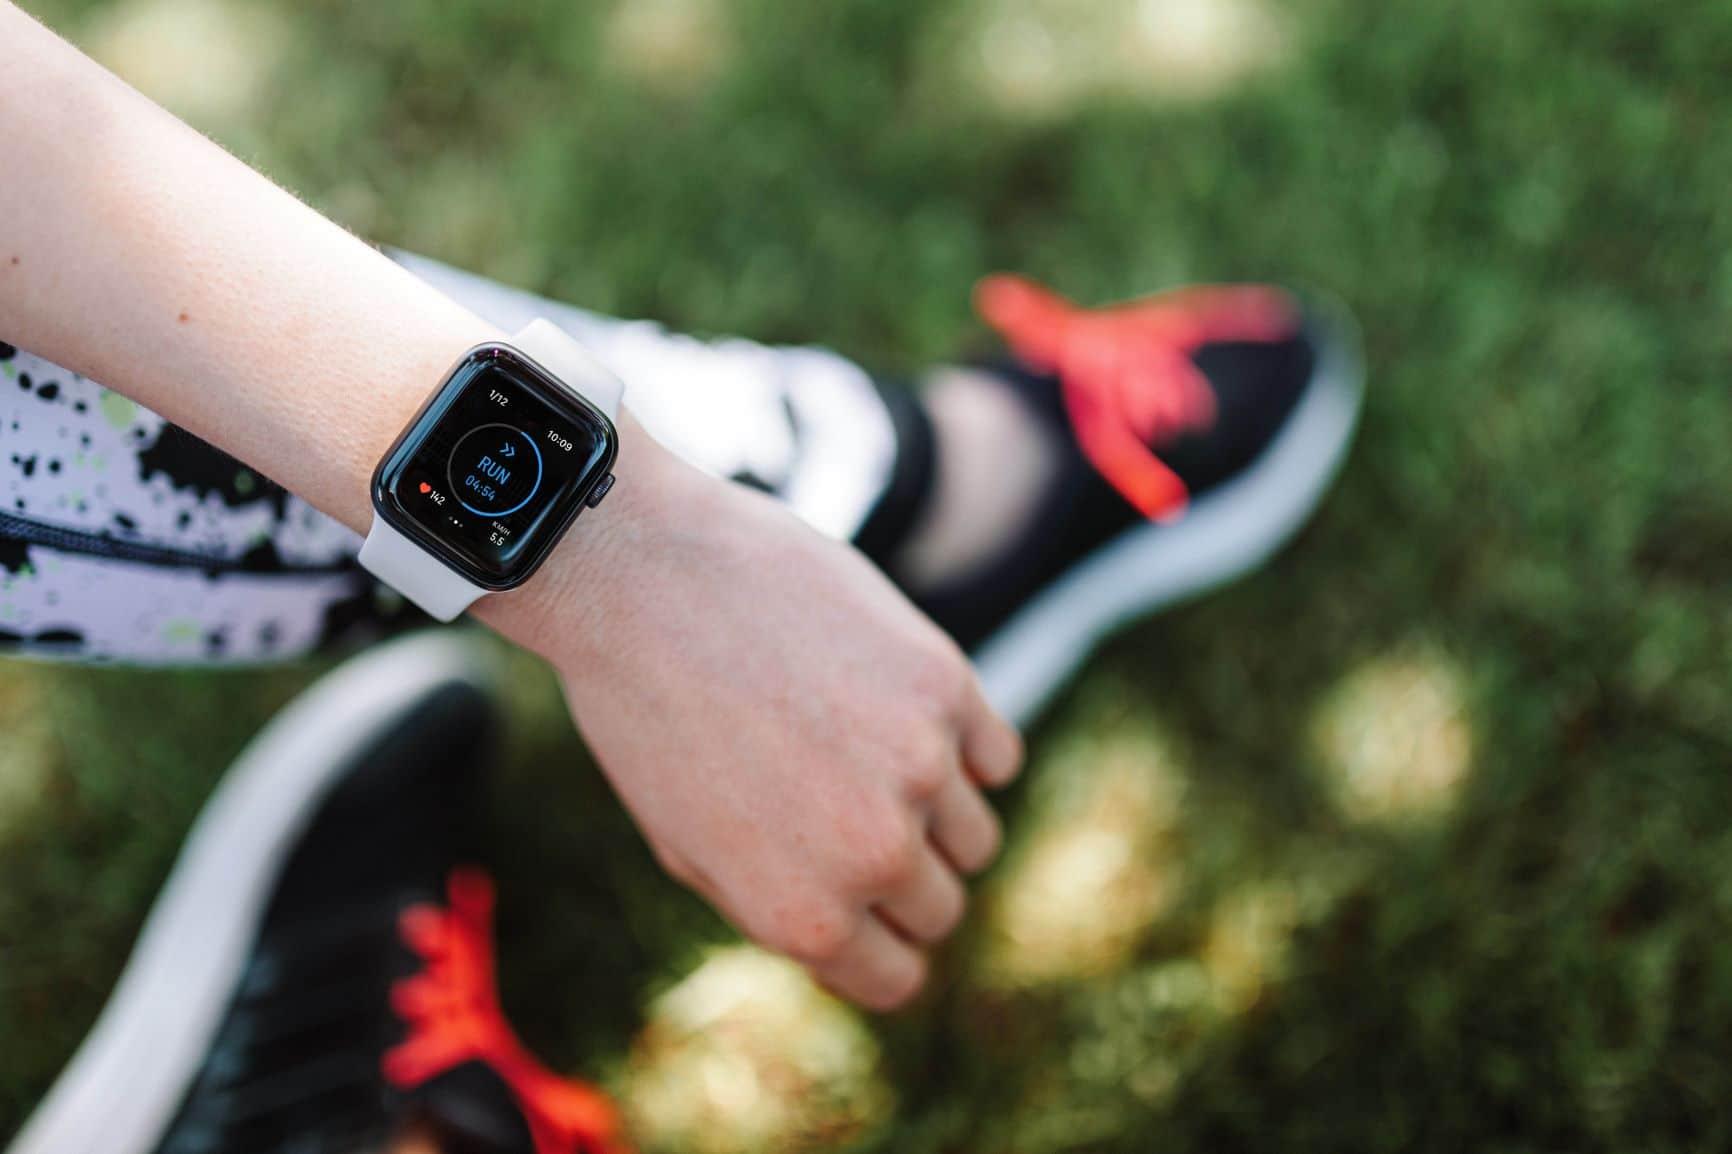 applewatch 4 Start 2 Run